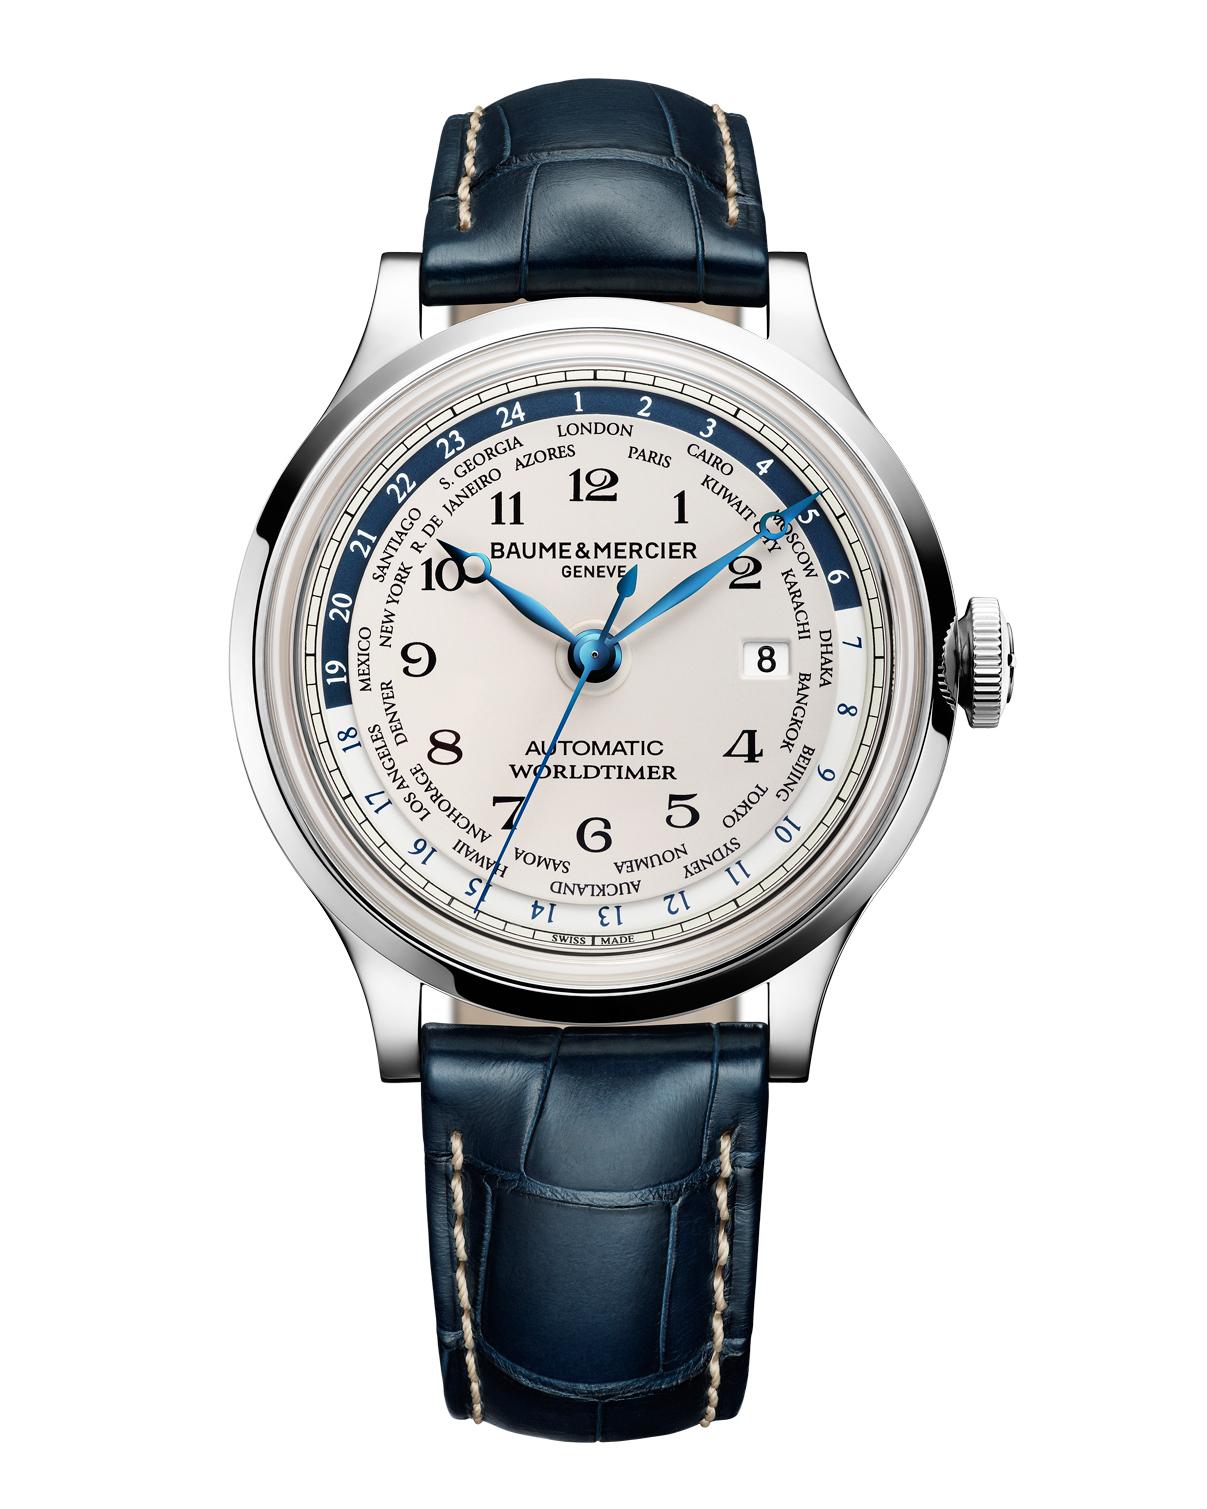 baume-mercier-watch-capeland-10106-0514.jpg